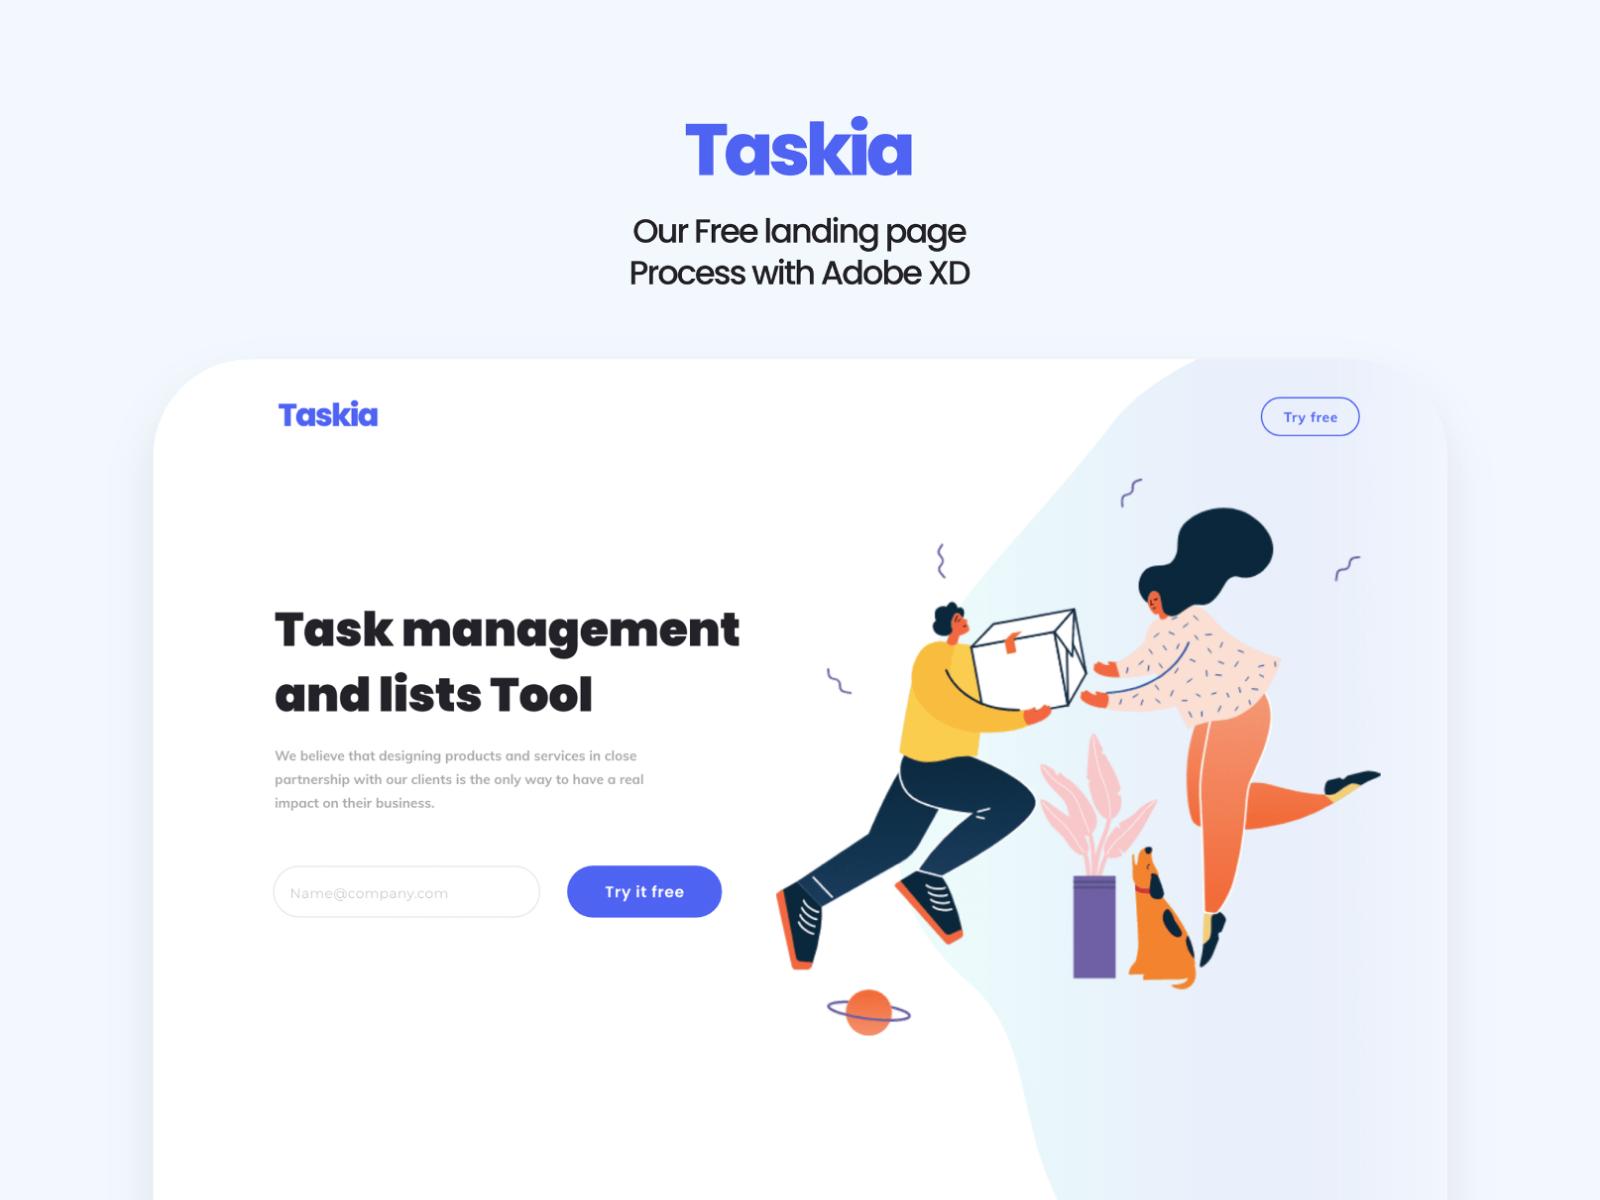 Taskia - Free Creative Landing Page cover image